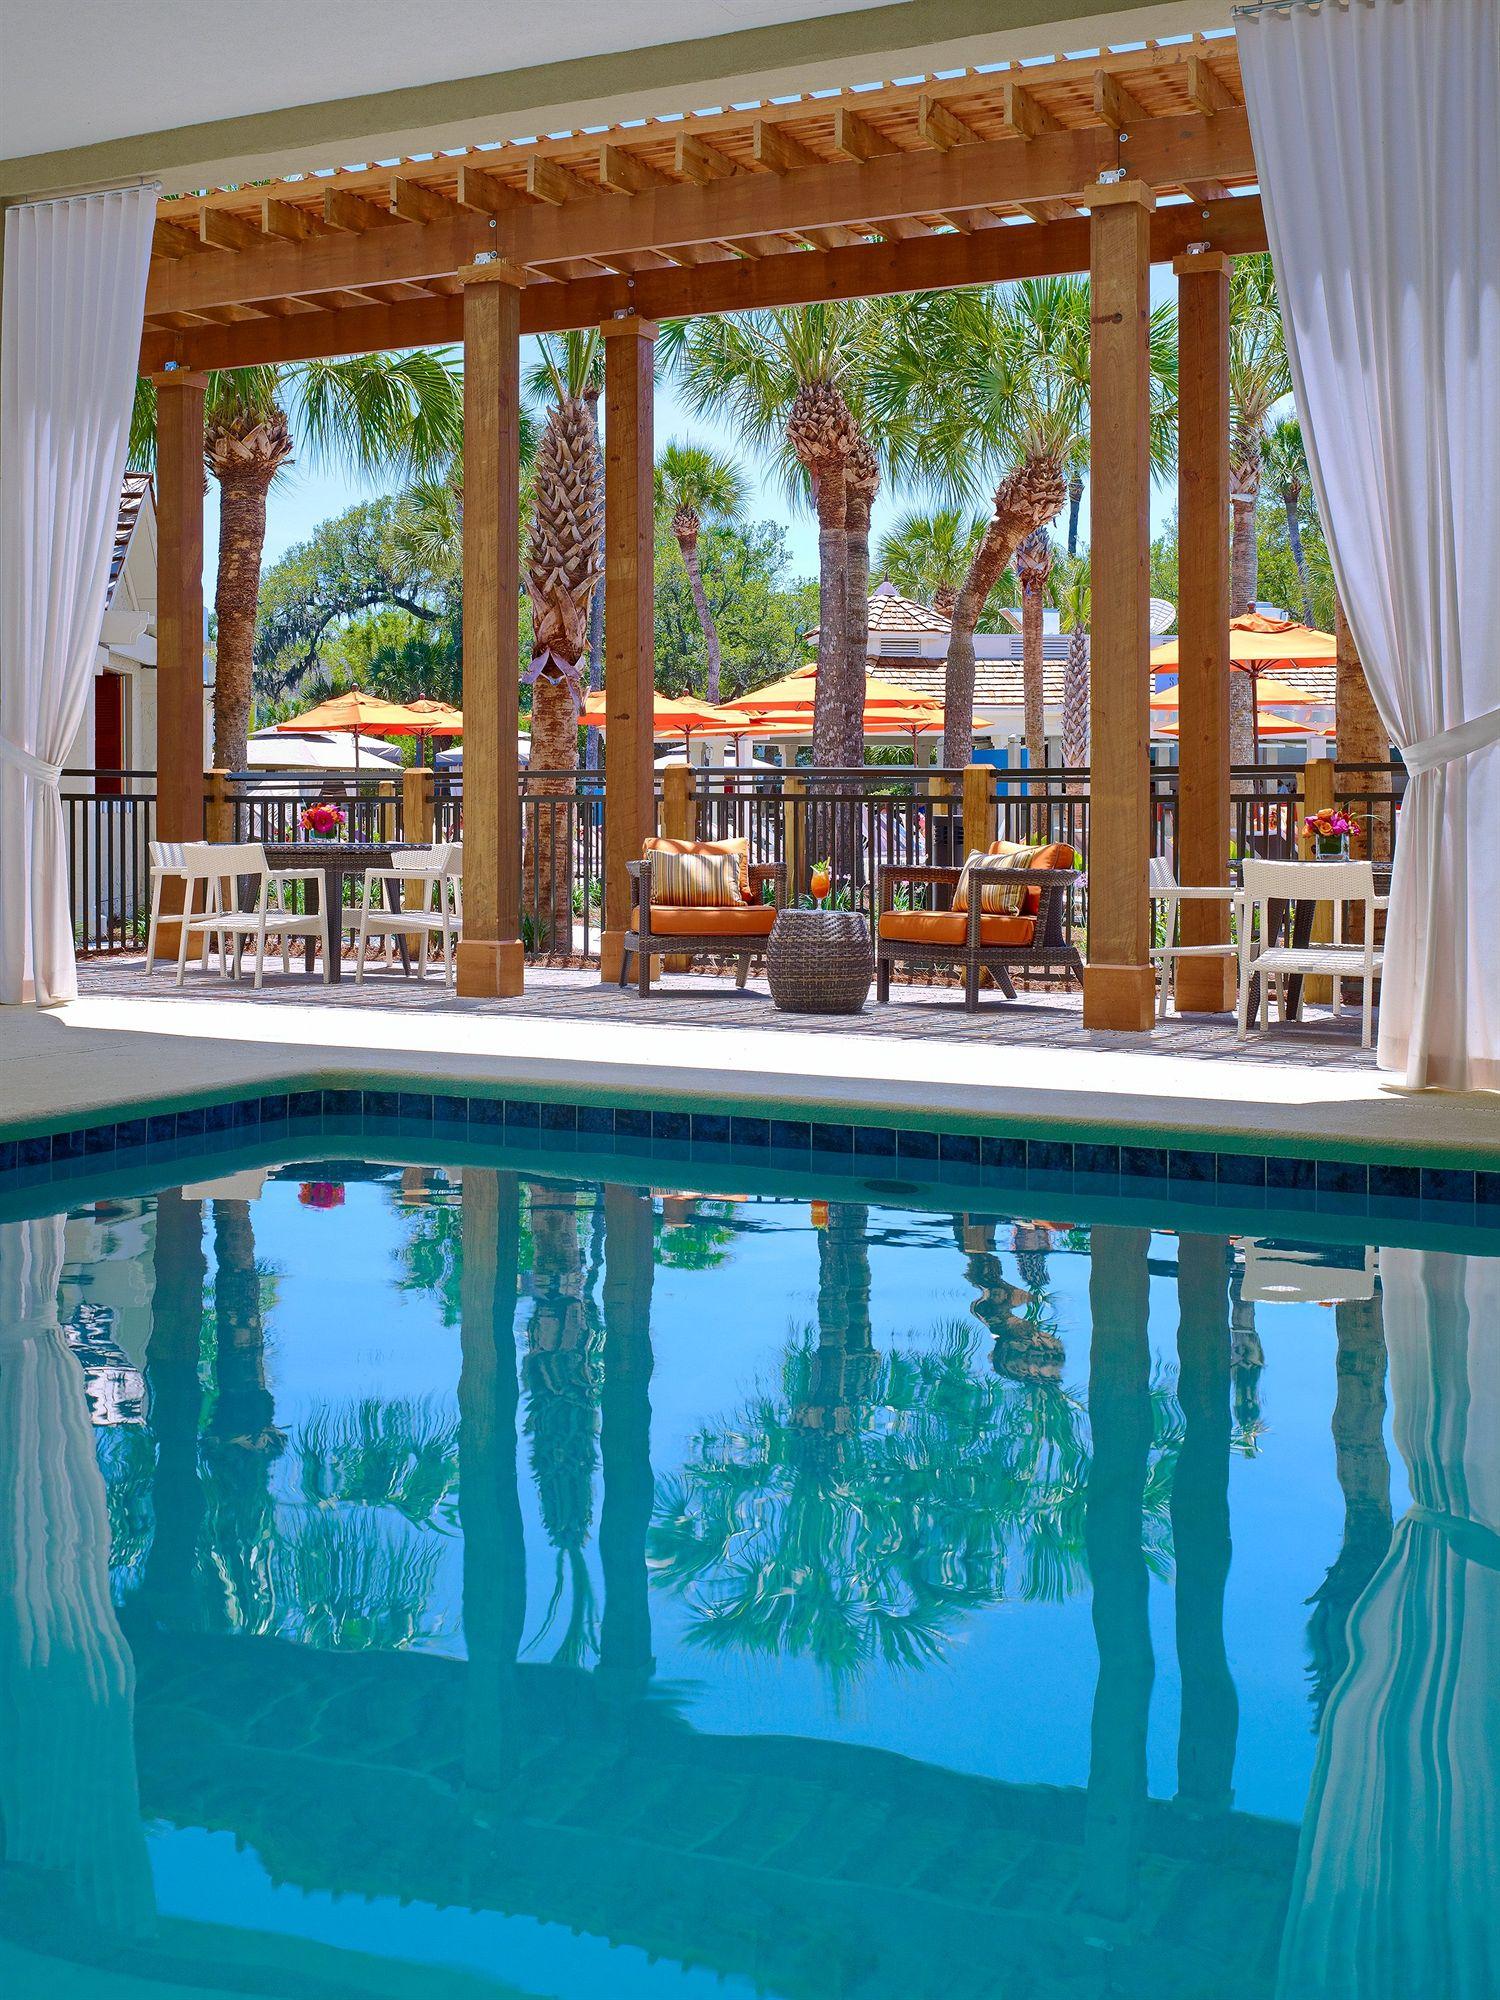 Sonesta Resort Hilton Head Island in Hilton Head, SC